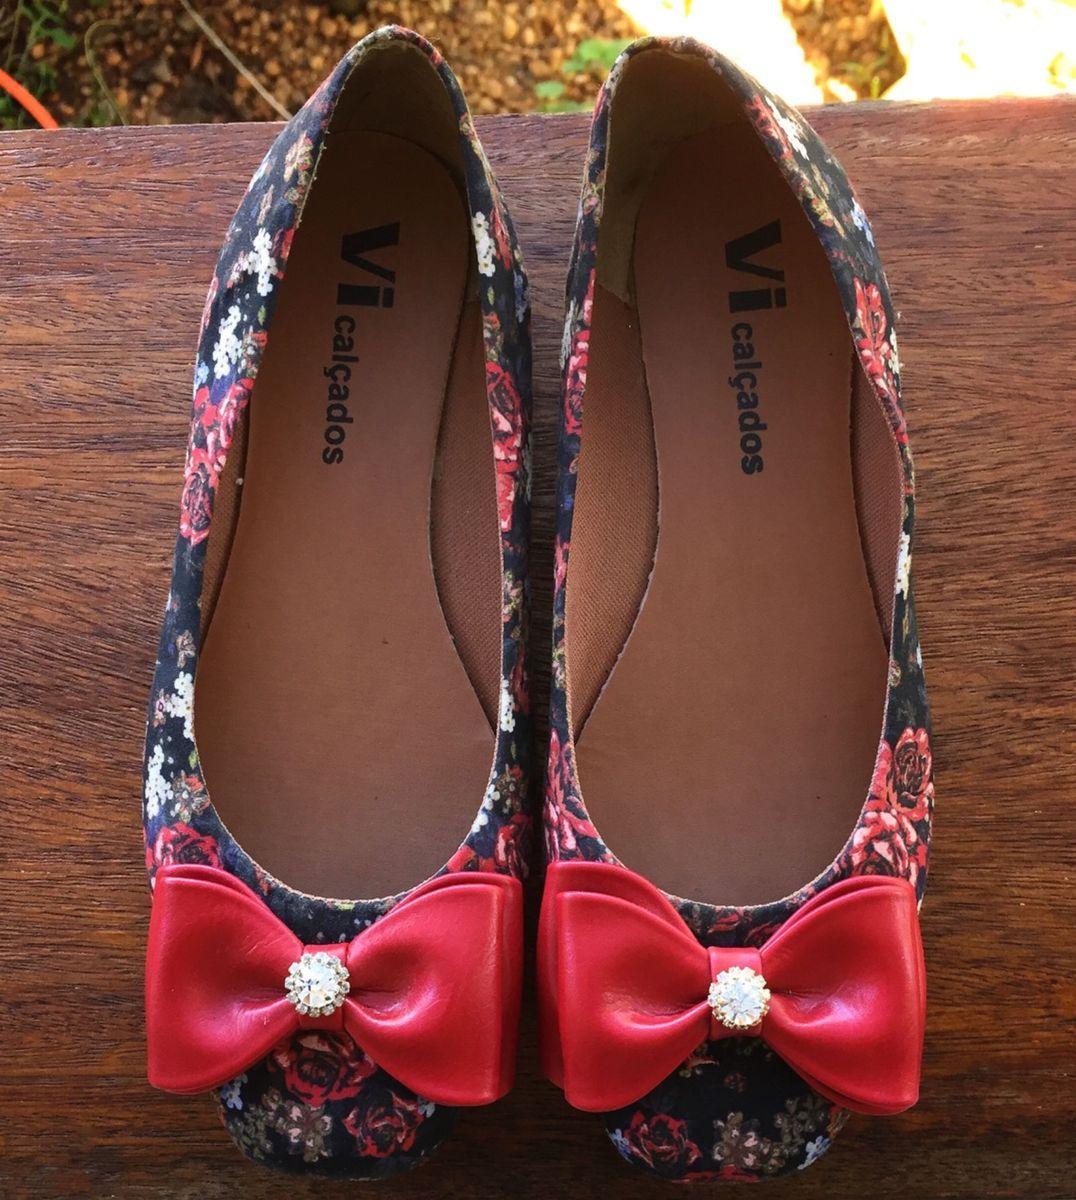 babcde4c9 sapatilha florida - sapatilha vi calçados.  Czm6ly9wag90b3muzw5qb2vplmnvbs5ici9wcm9kdwn0cy82nde1njeylzmxnmi0mjuwmzvjytjjnmuxnzuwotuymmyyymywyzhhlmpwzw